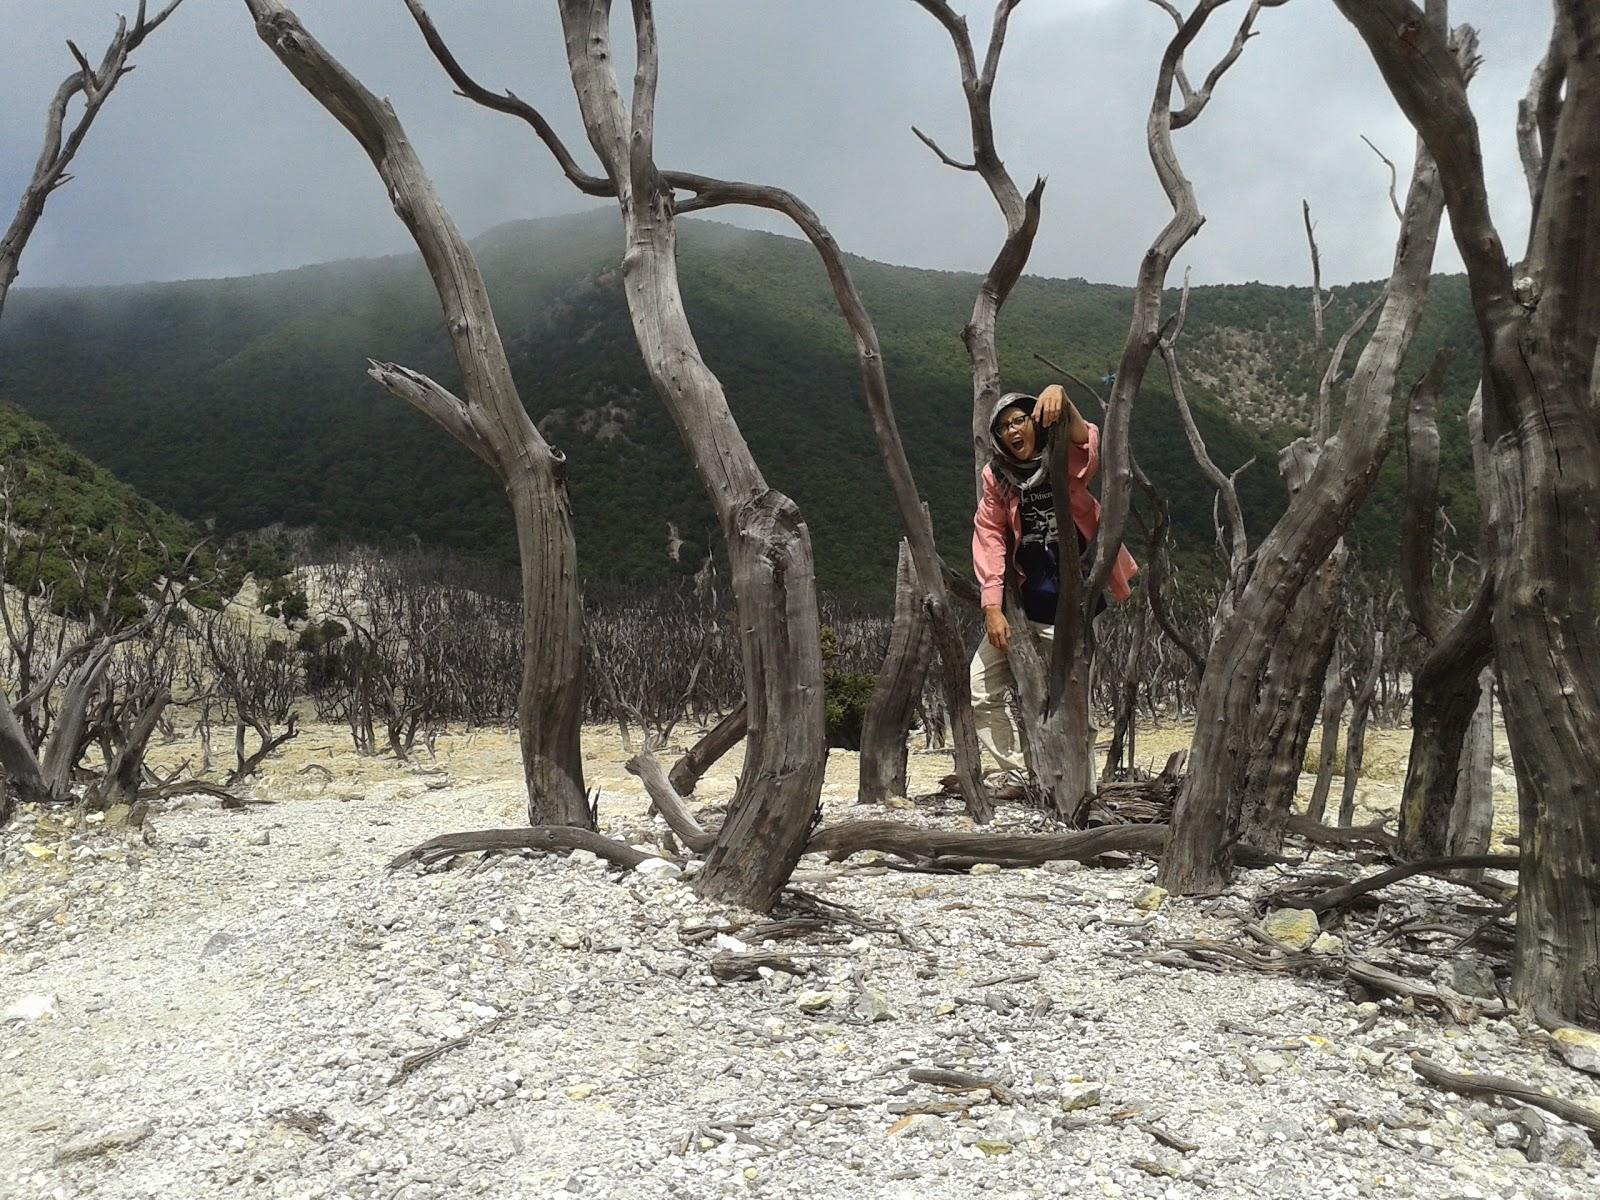 pohon tidak berdaun di hutan mati membuat terik langsung masuk ke otak